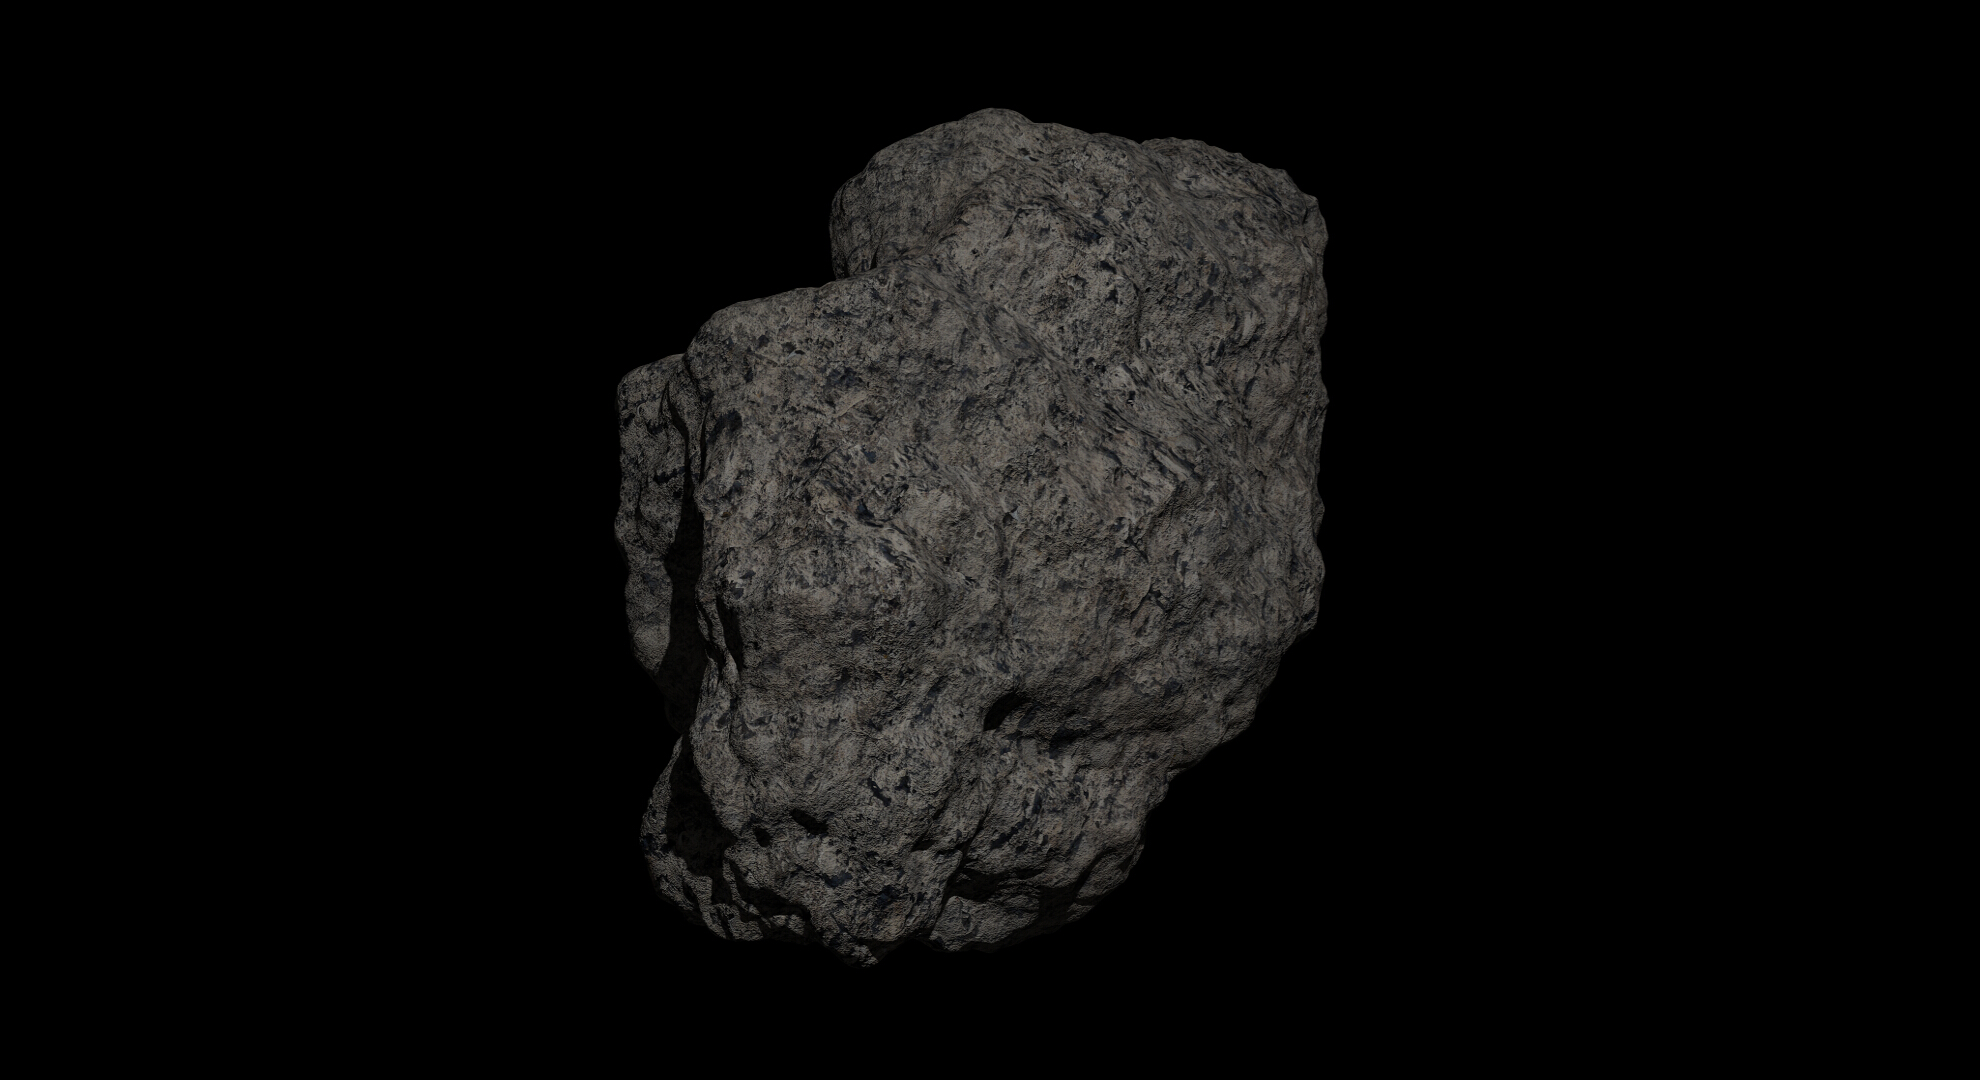 fantasy asteroid 2 3d model 3ds blend dae fbx obj 267197